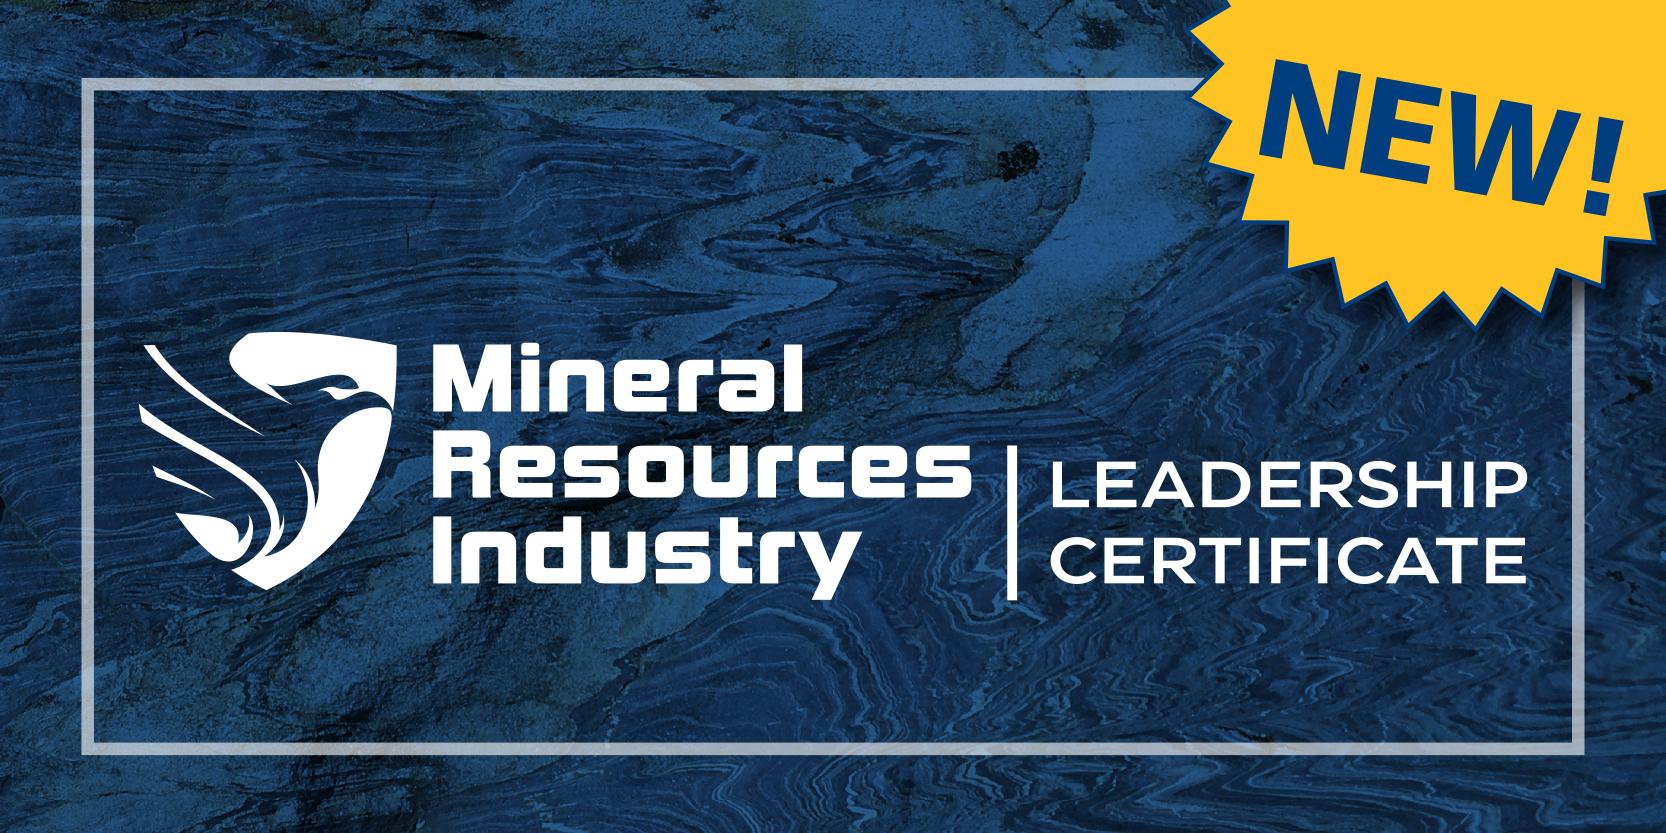 MineralResourcesIndustry